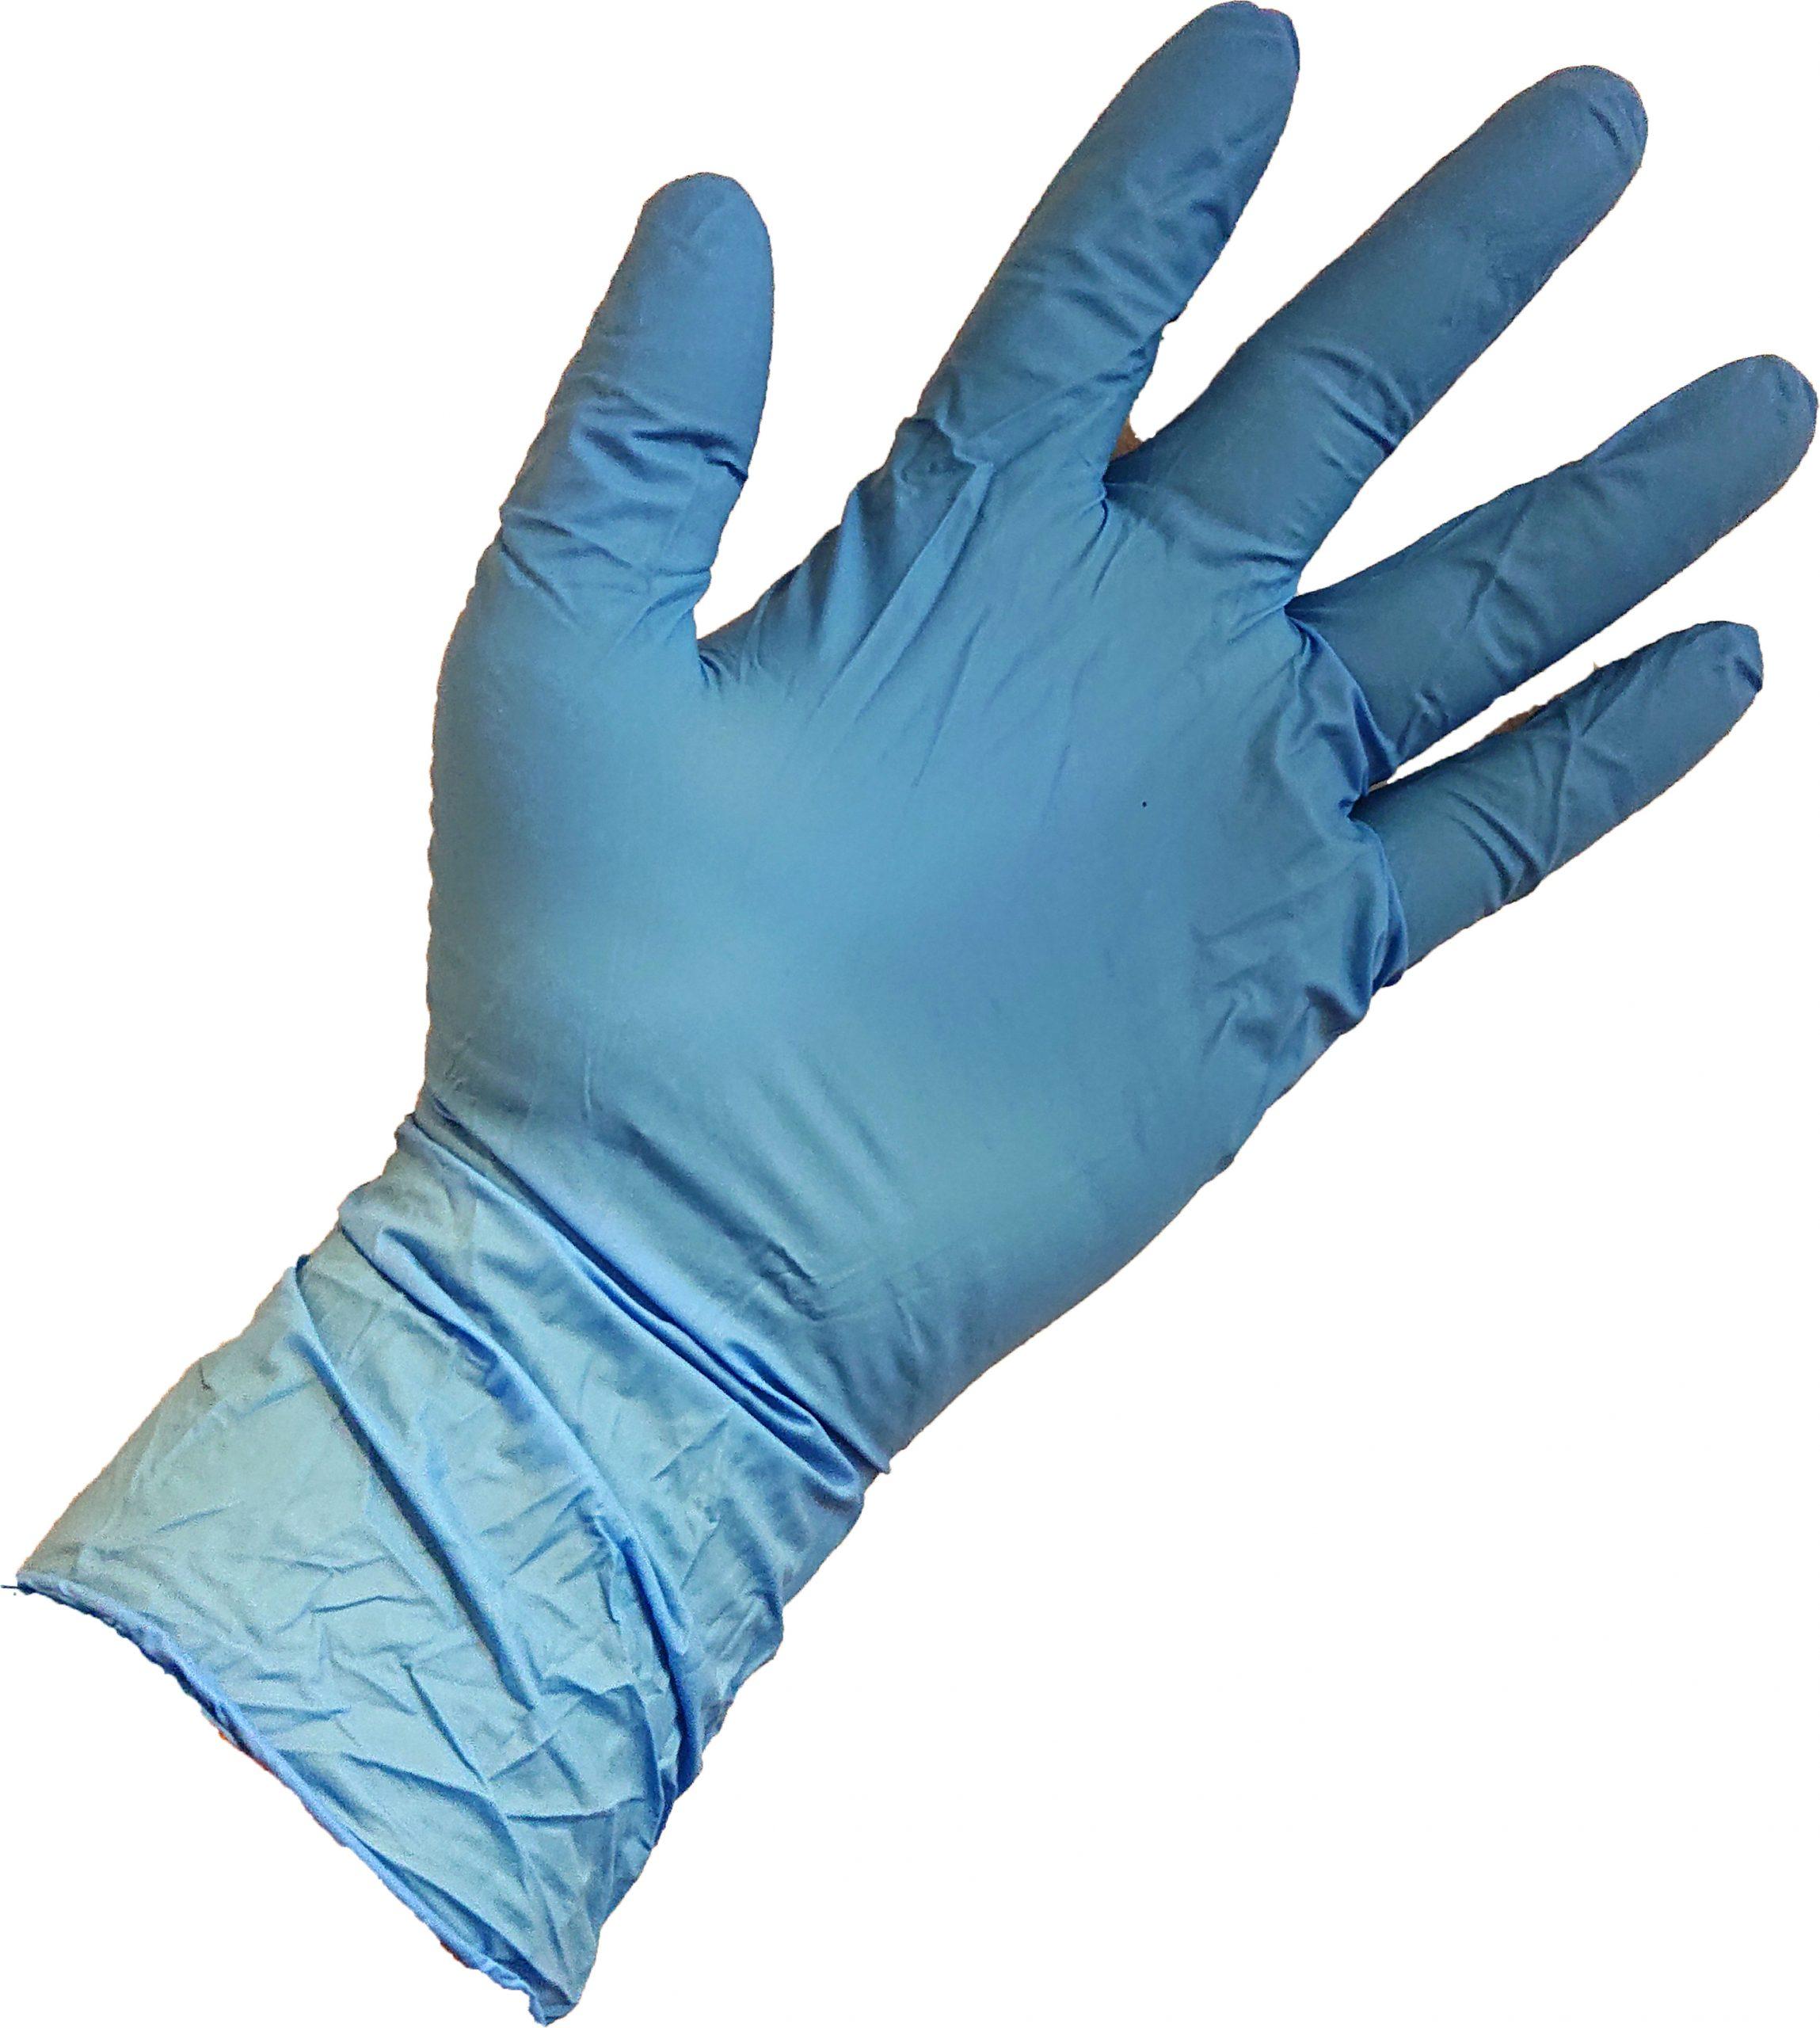 Nitrile Gloves - Single Box (100 Gloves) - Extra Length